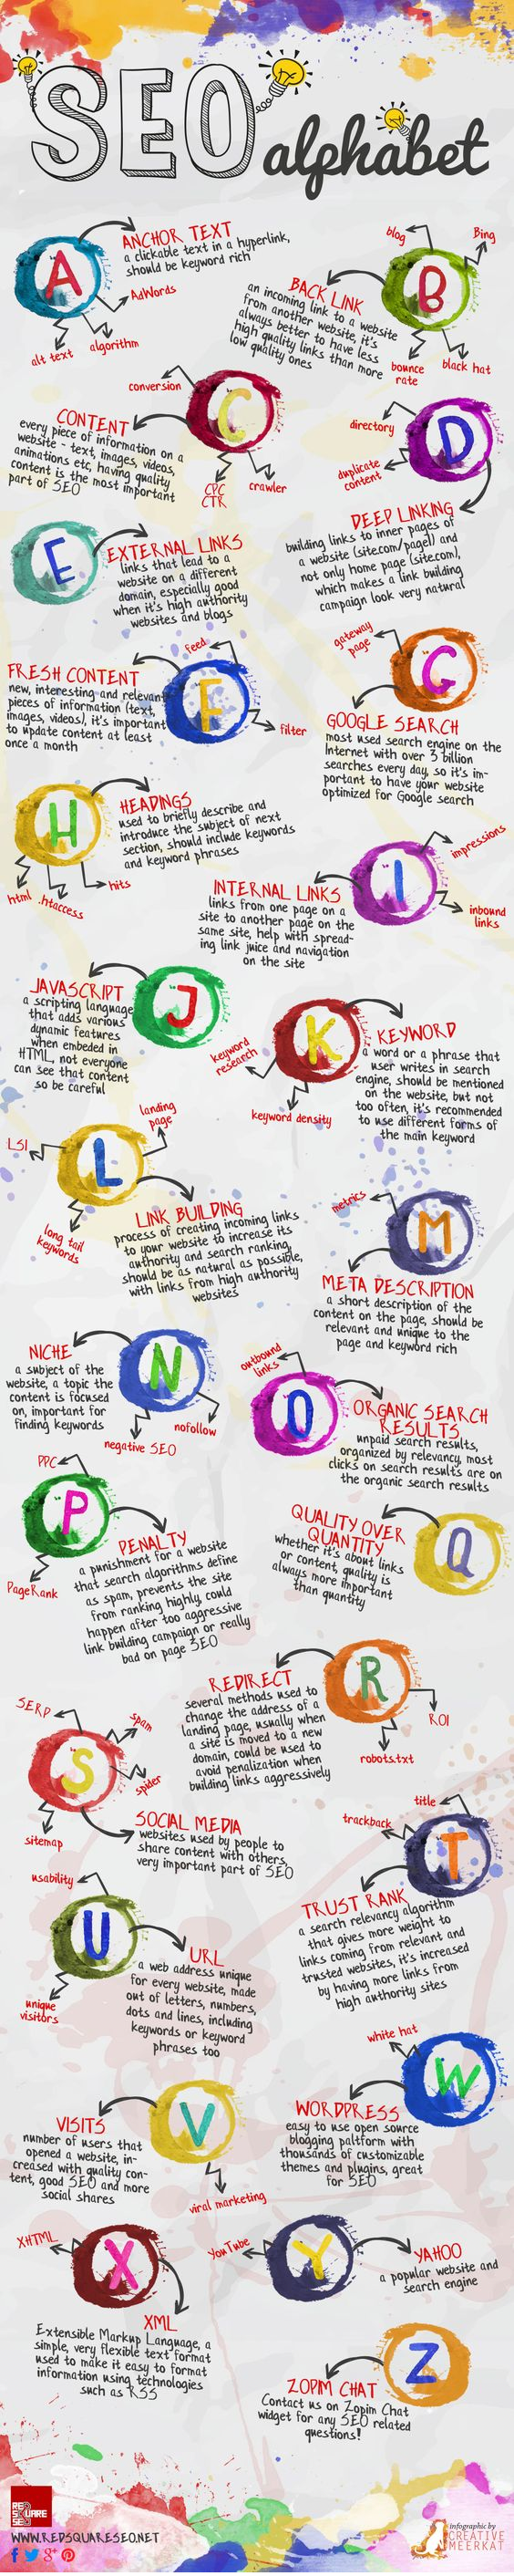 infografia conceptos basicos seo